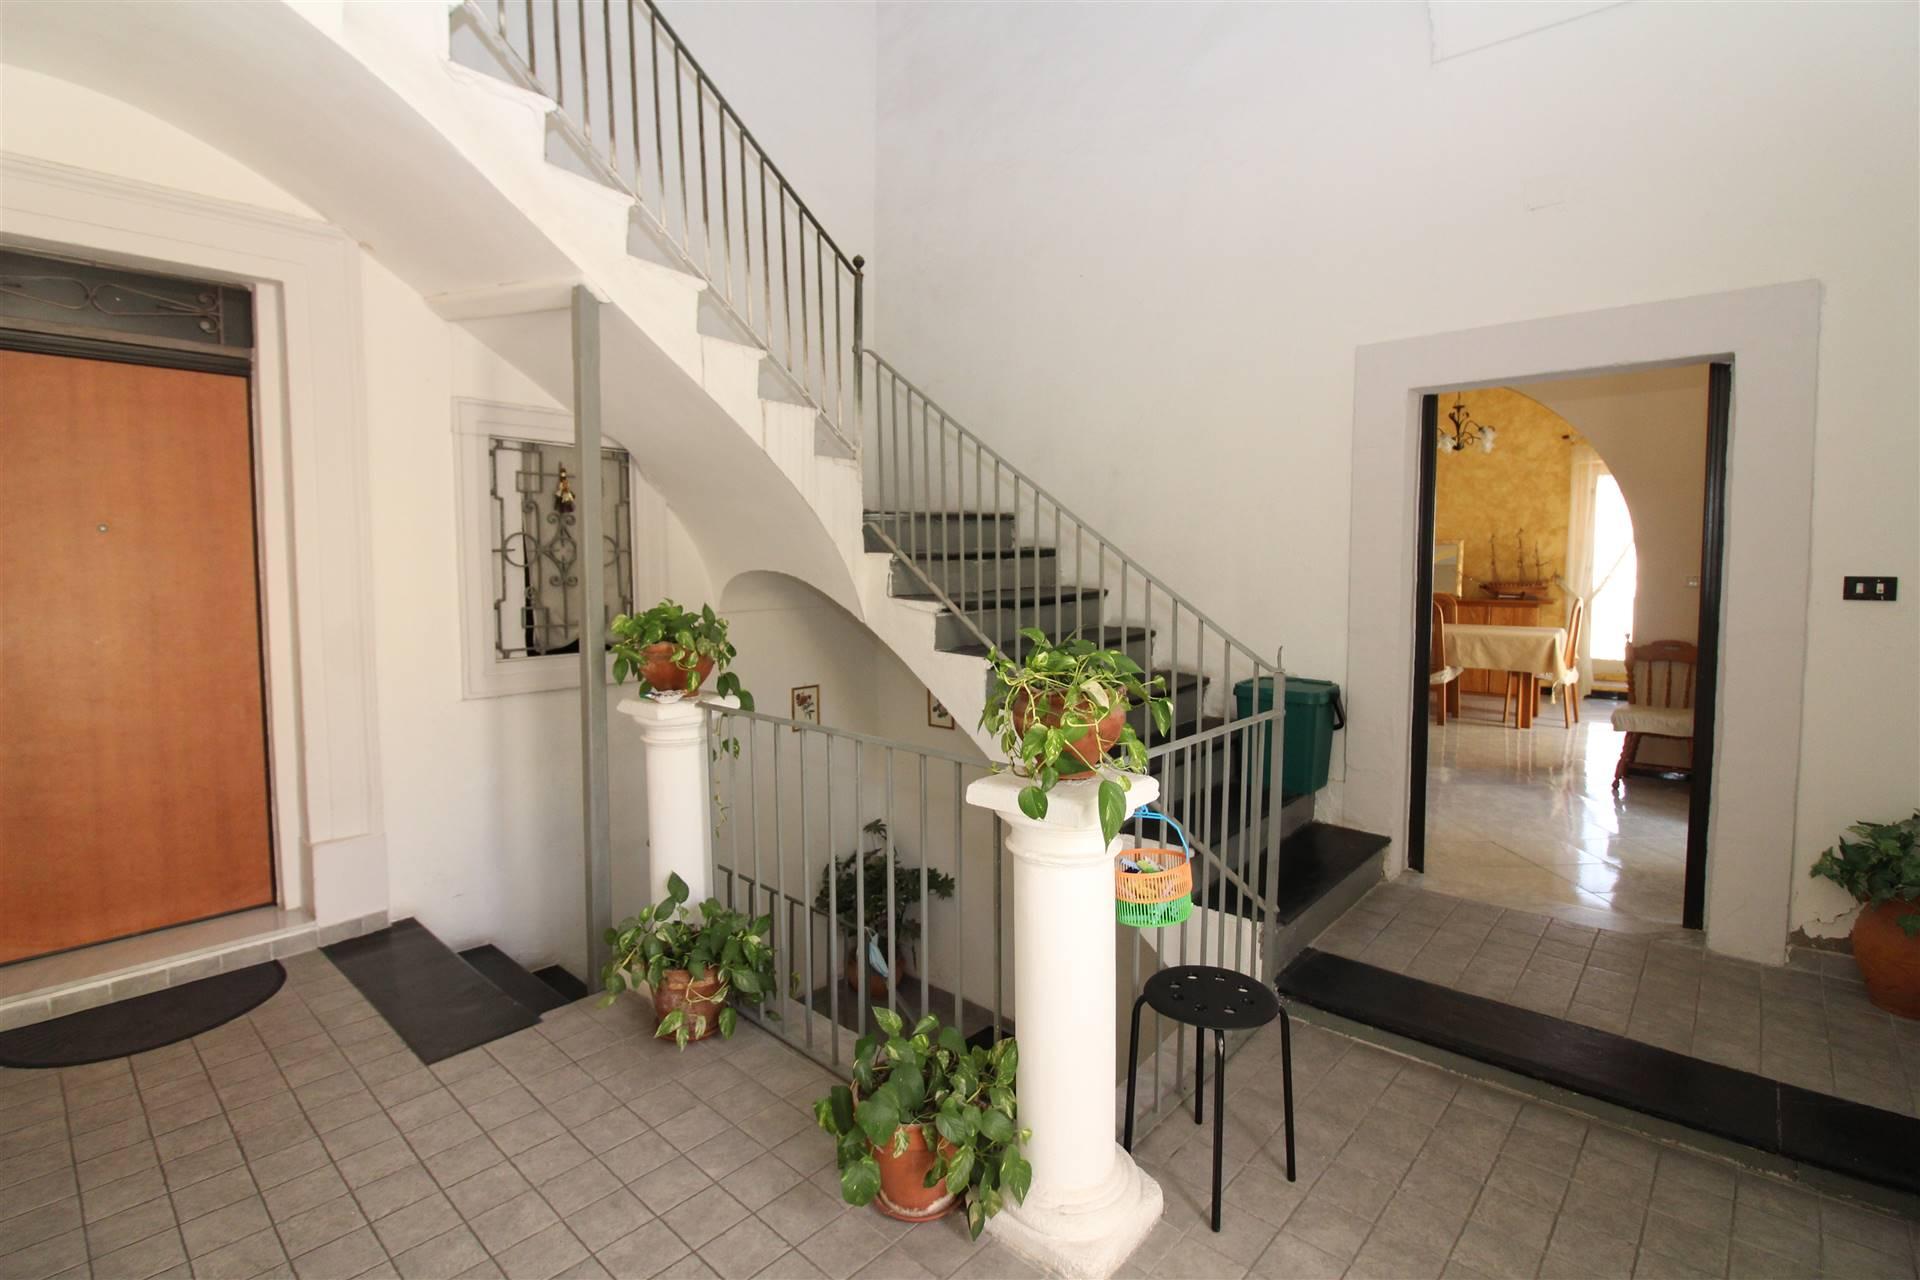 AppartamentoaFRANCOFONTE